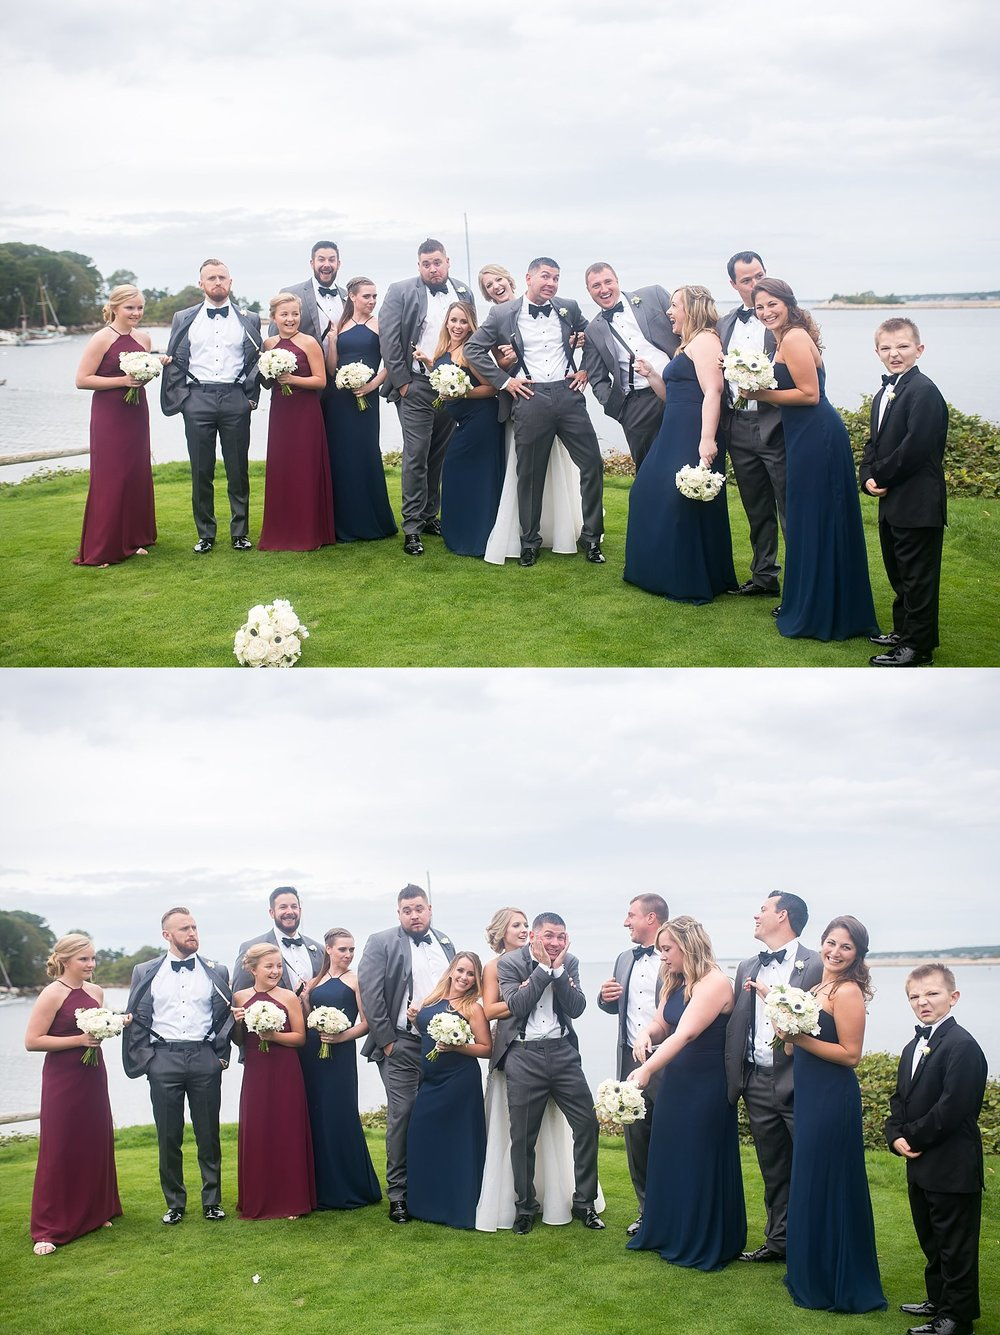 bridal party photographs.jpg